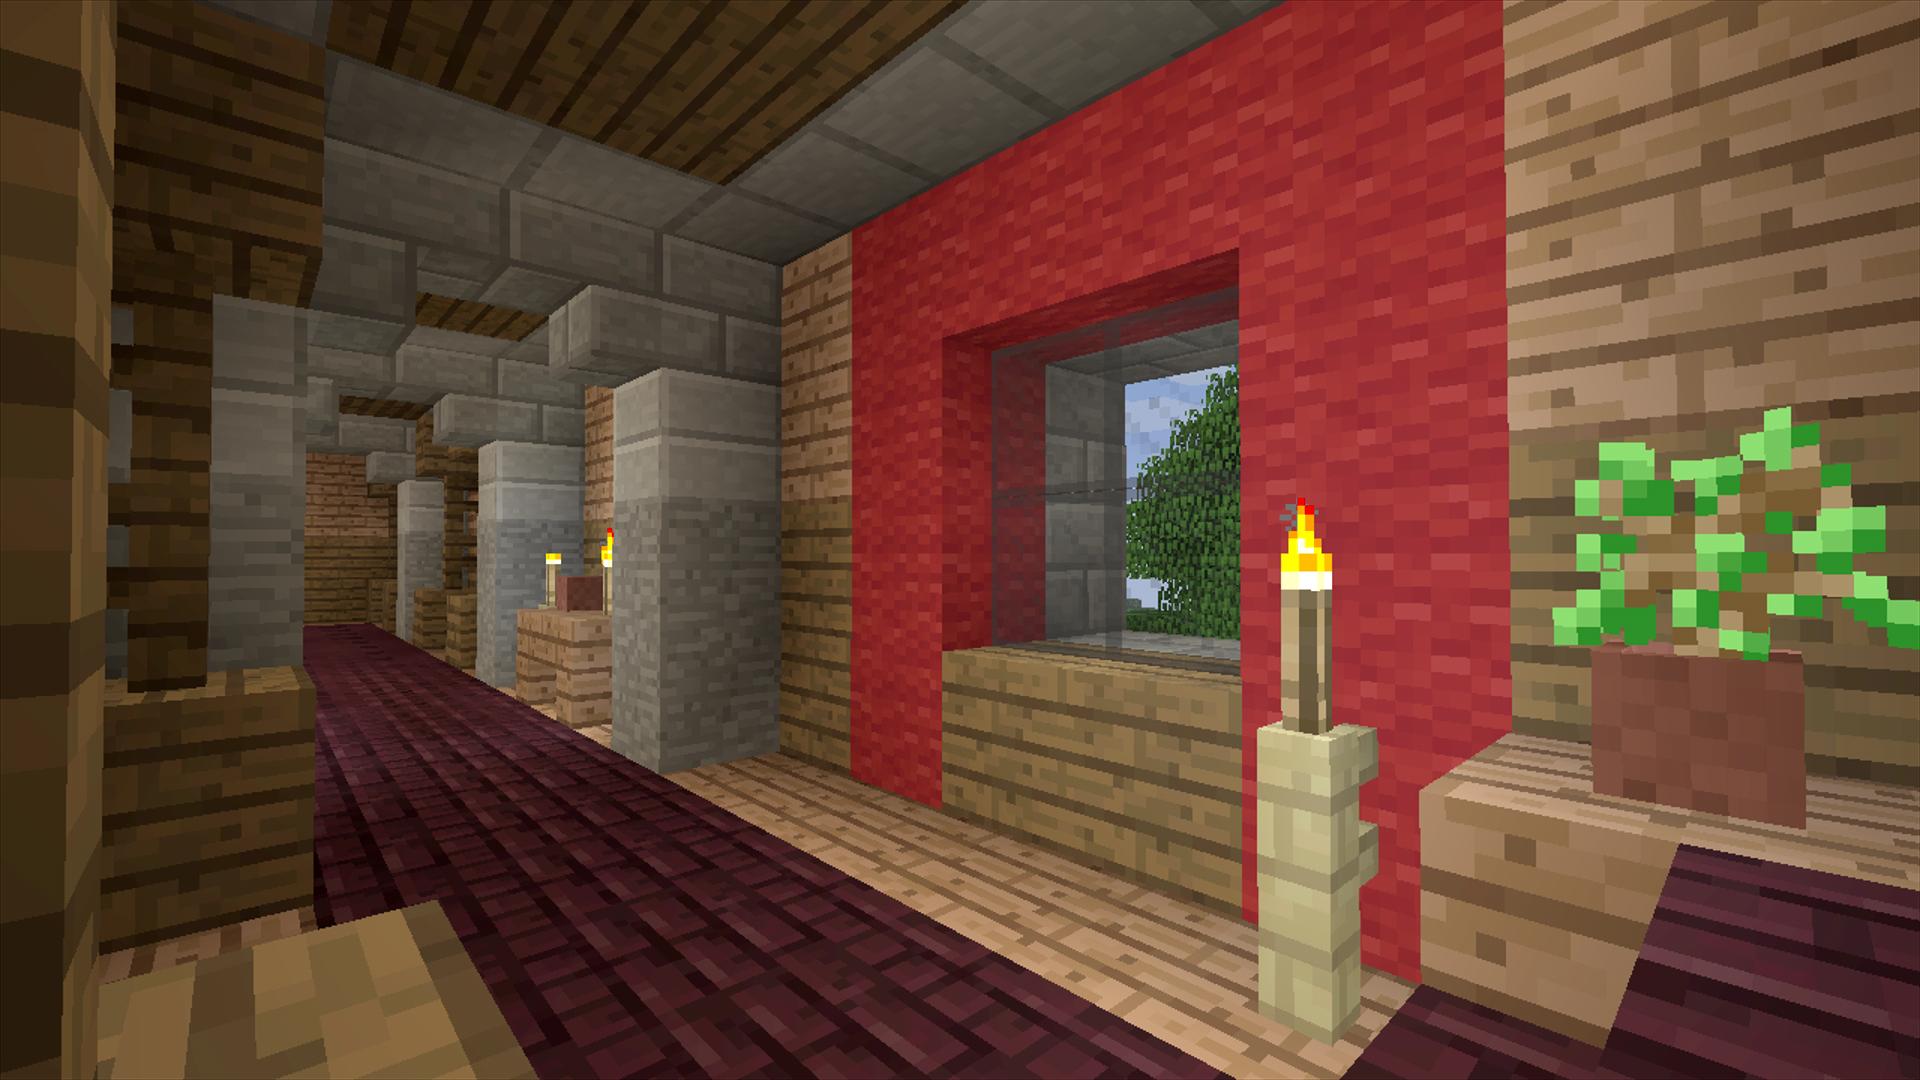 Minecraft Screen Shot 2-16-19, 1.40 PM 2.png